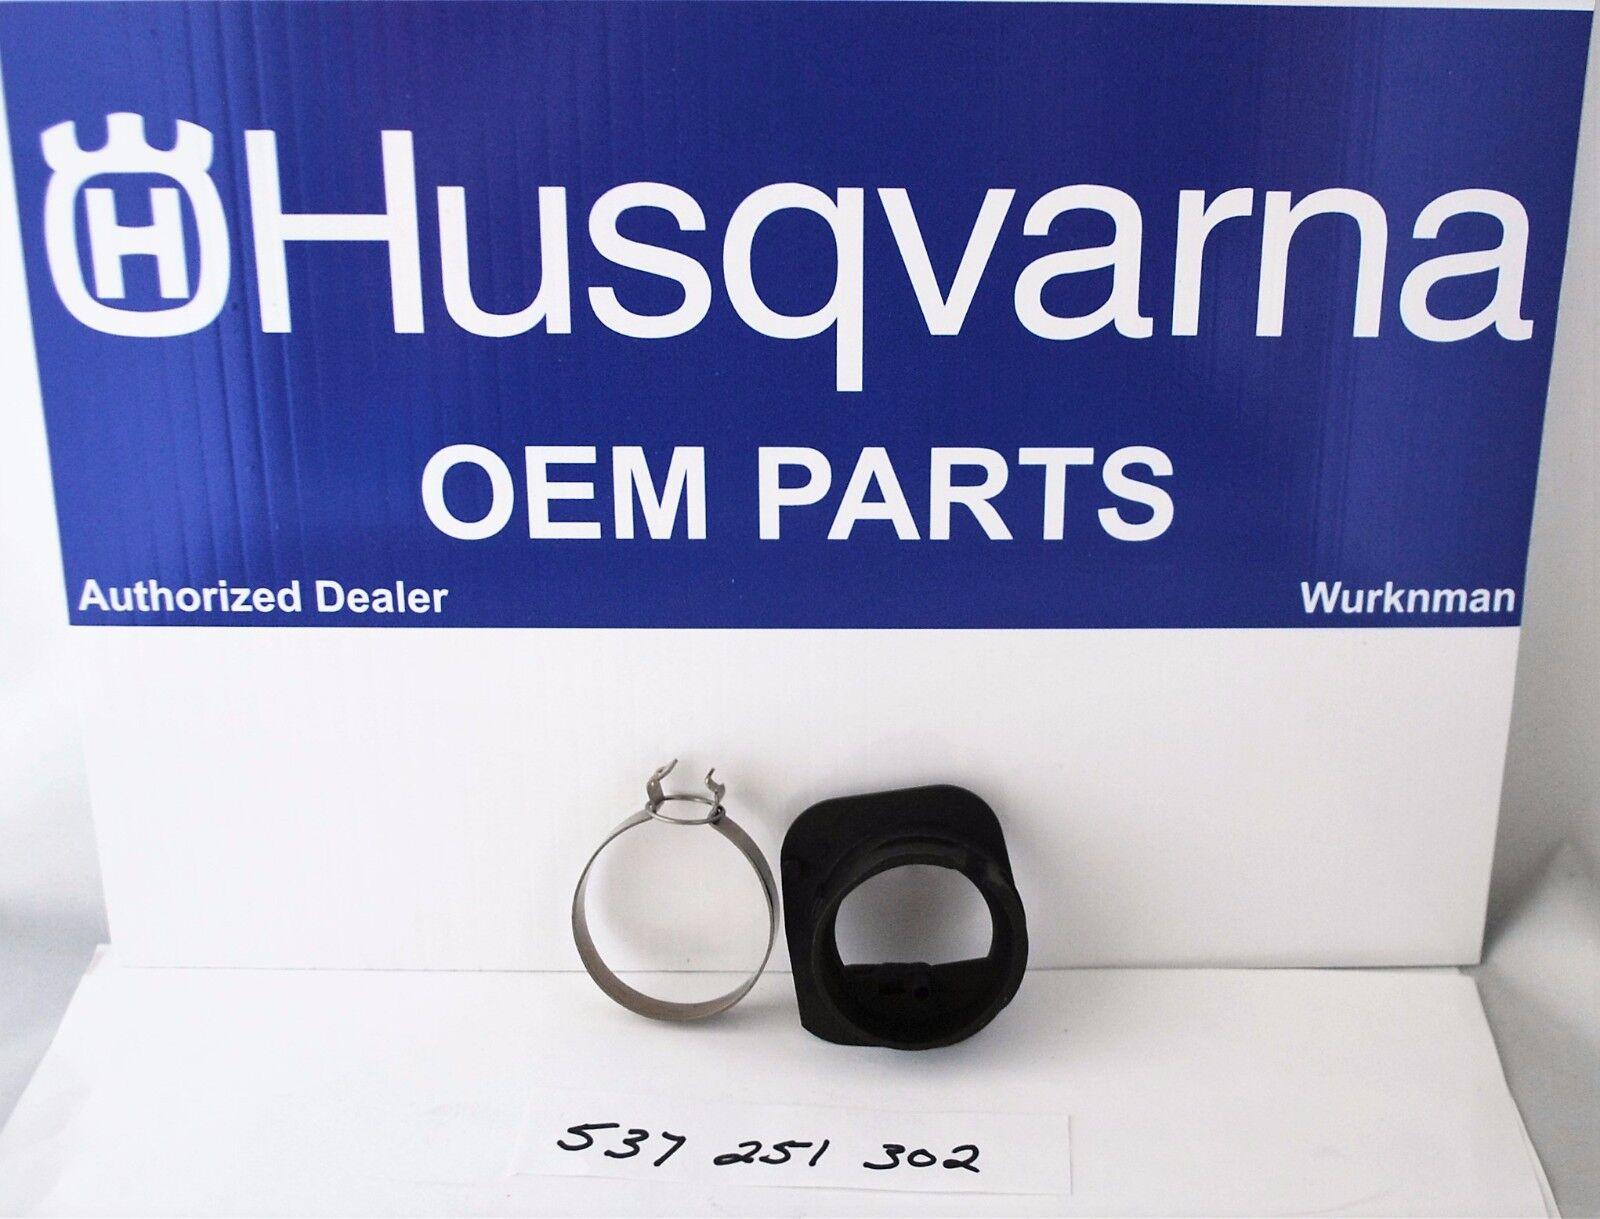 Intake-Clamp Husqvarna 340 E 346 XP 350 353 357 XP 359 Chainsaw 537438801 OEM